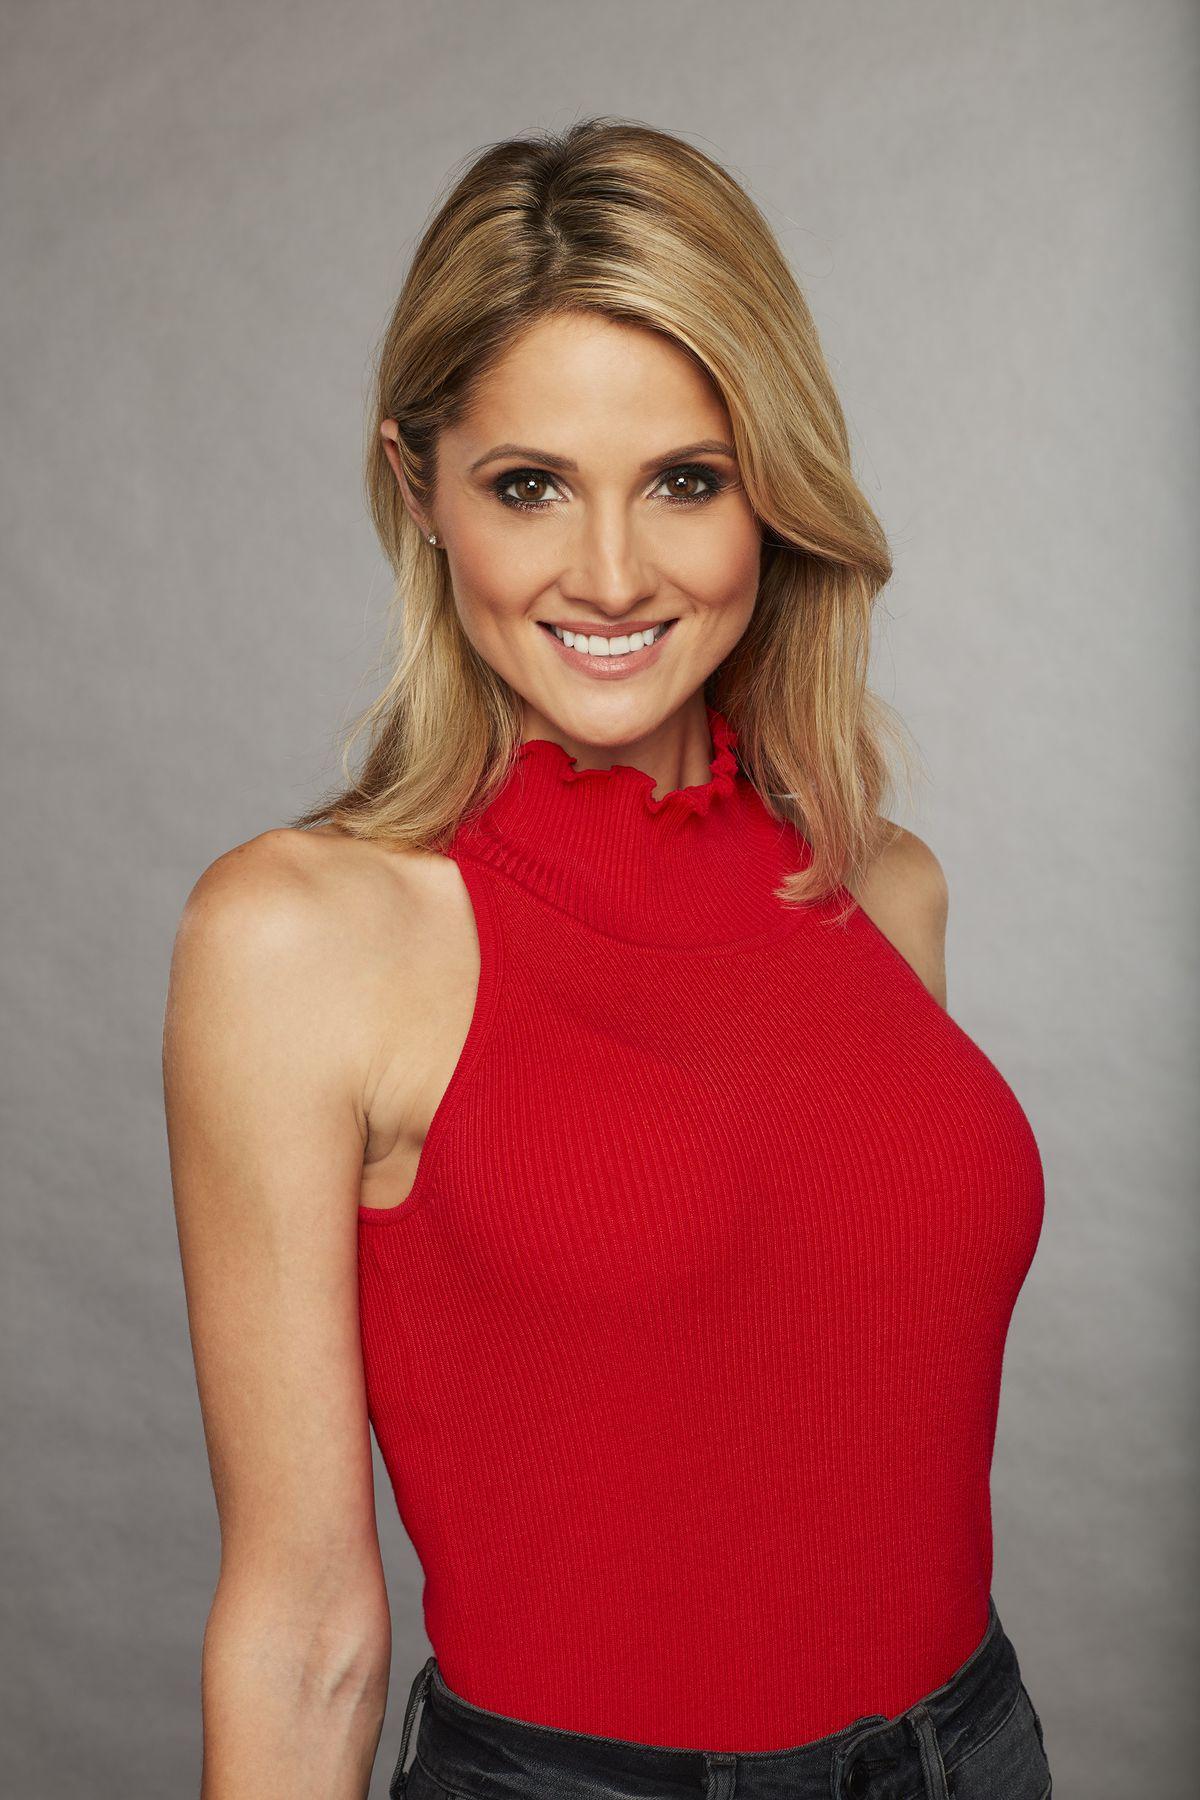 Bachelor contestant Lauren J., 33